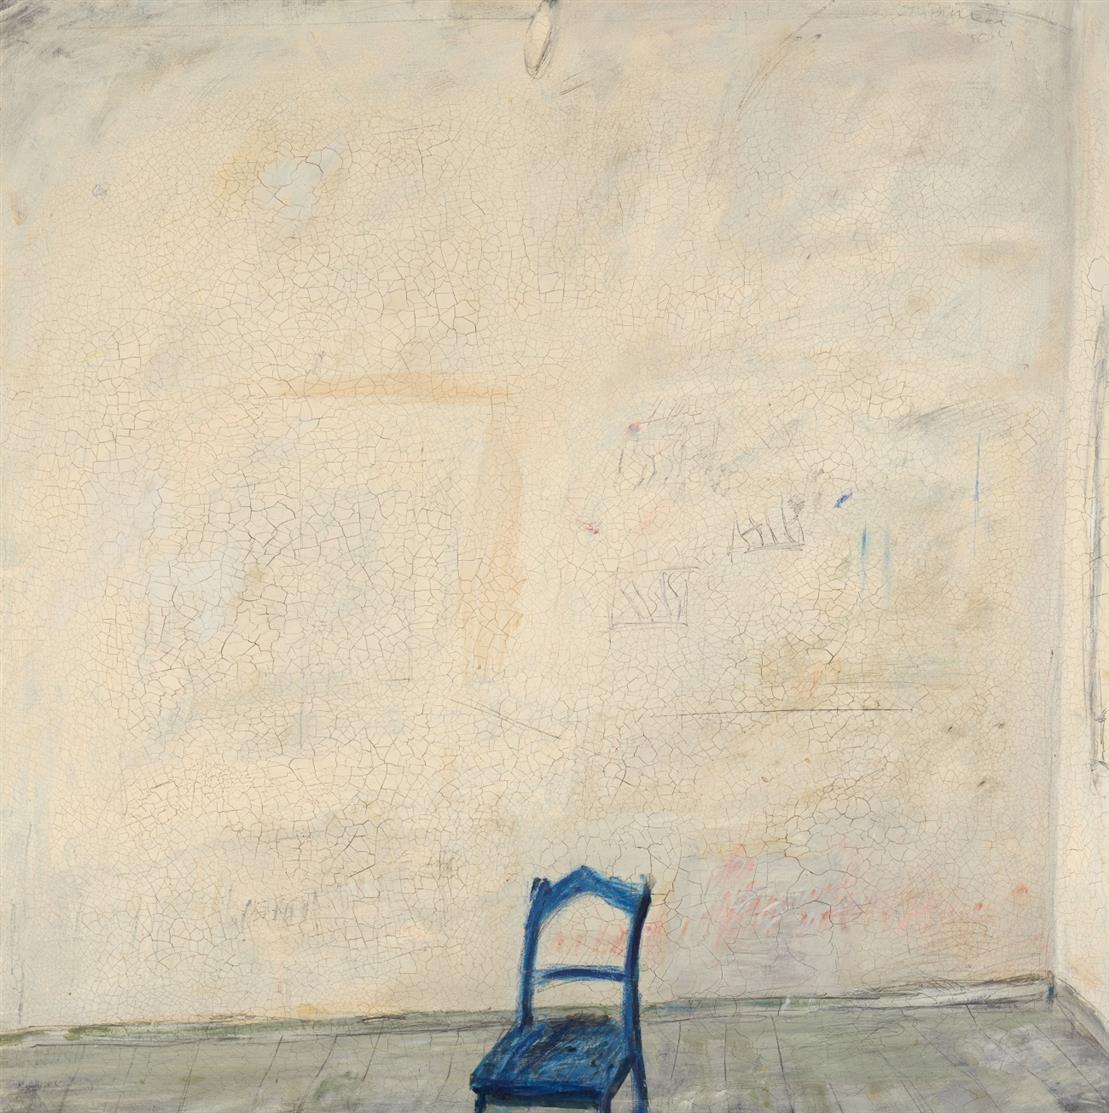 Klaus Fussmann. Interieur III. 1970.  Öl auf Leinwand. Signiert. (Krakelee).